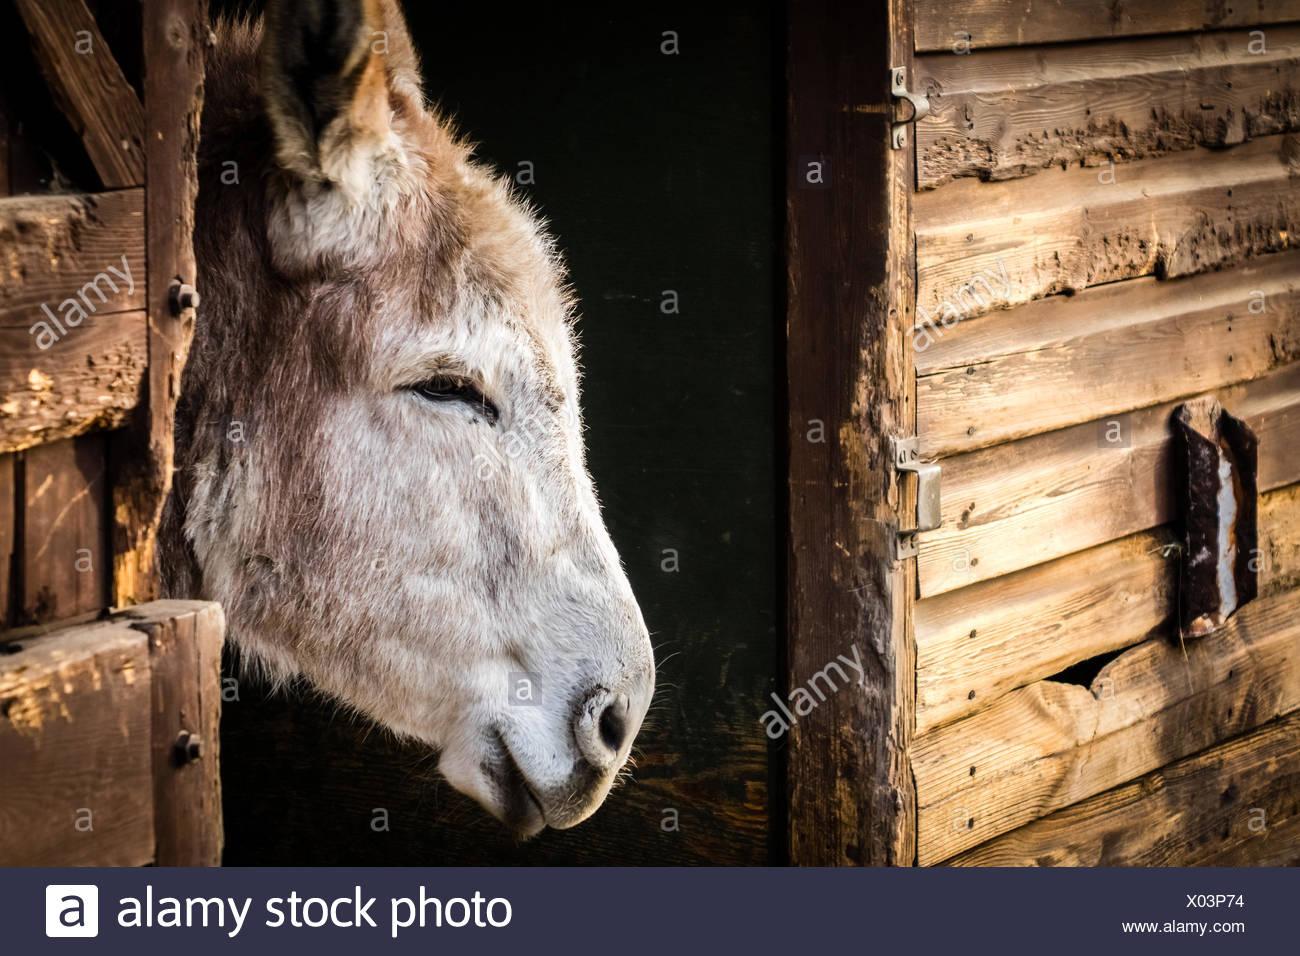 Donkey in a barn Stock Photo